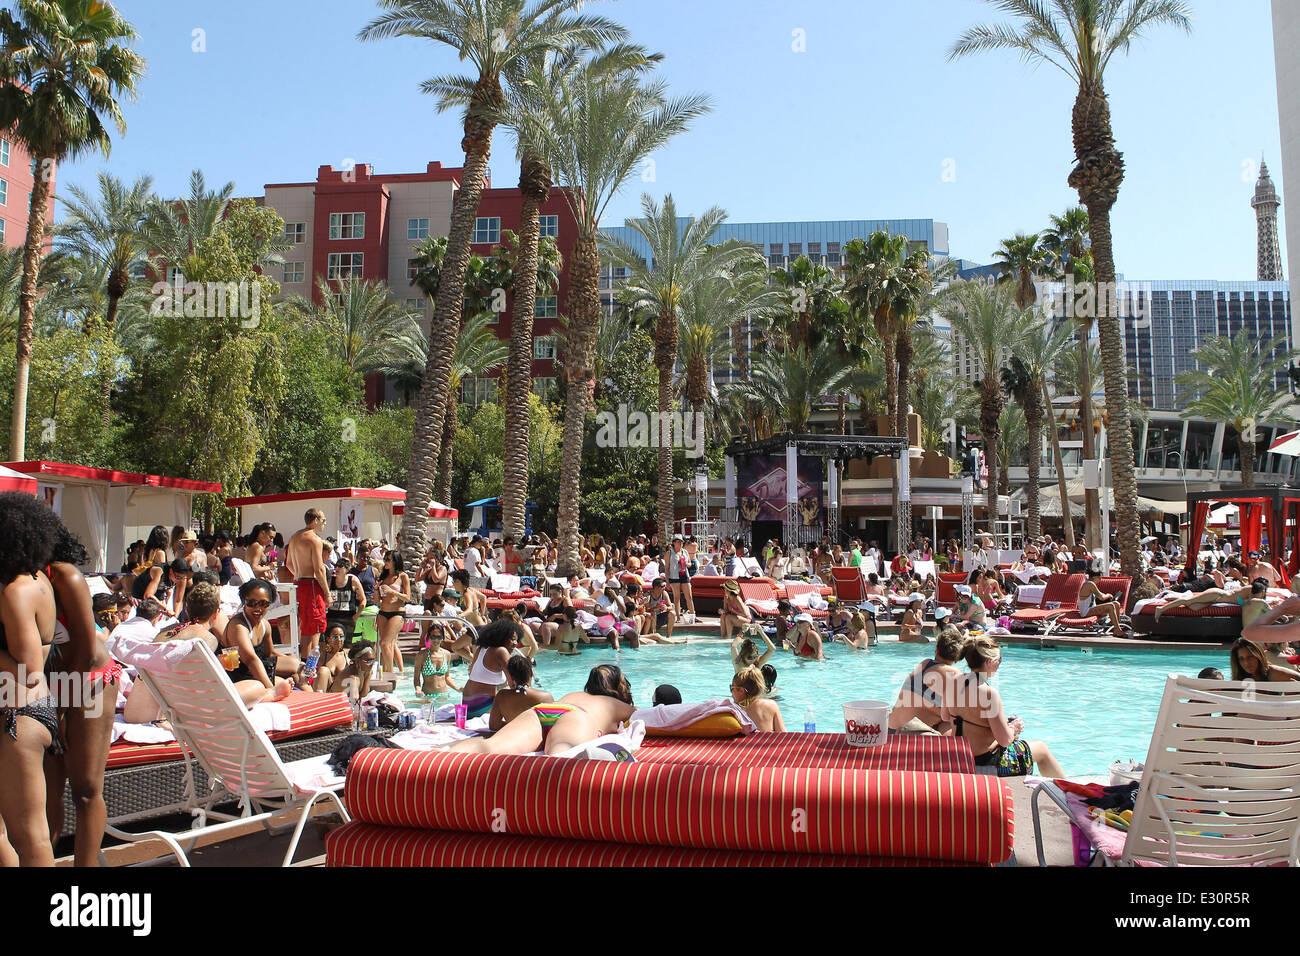 Dinah Shore Las Vegas weekend INFINITY Pool Party 2013 Featuring